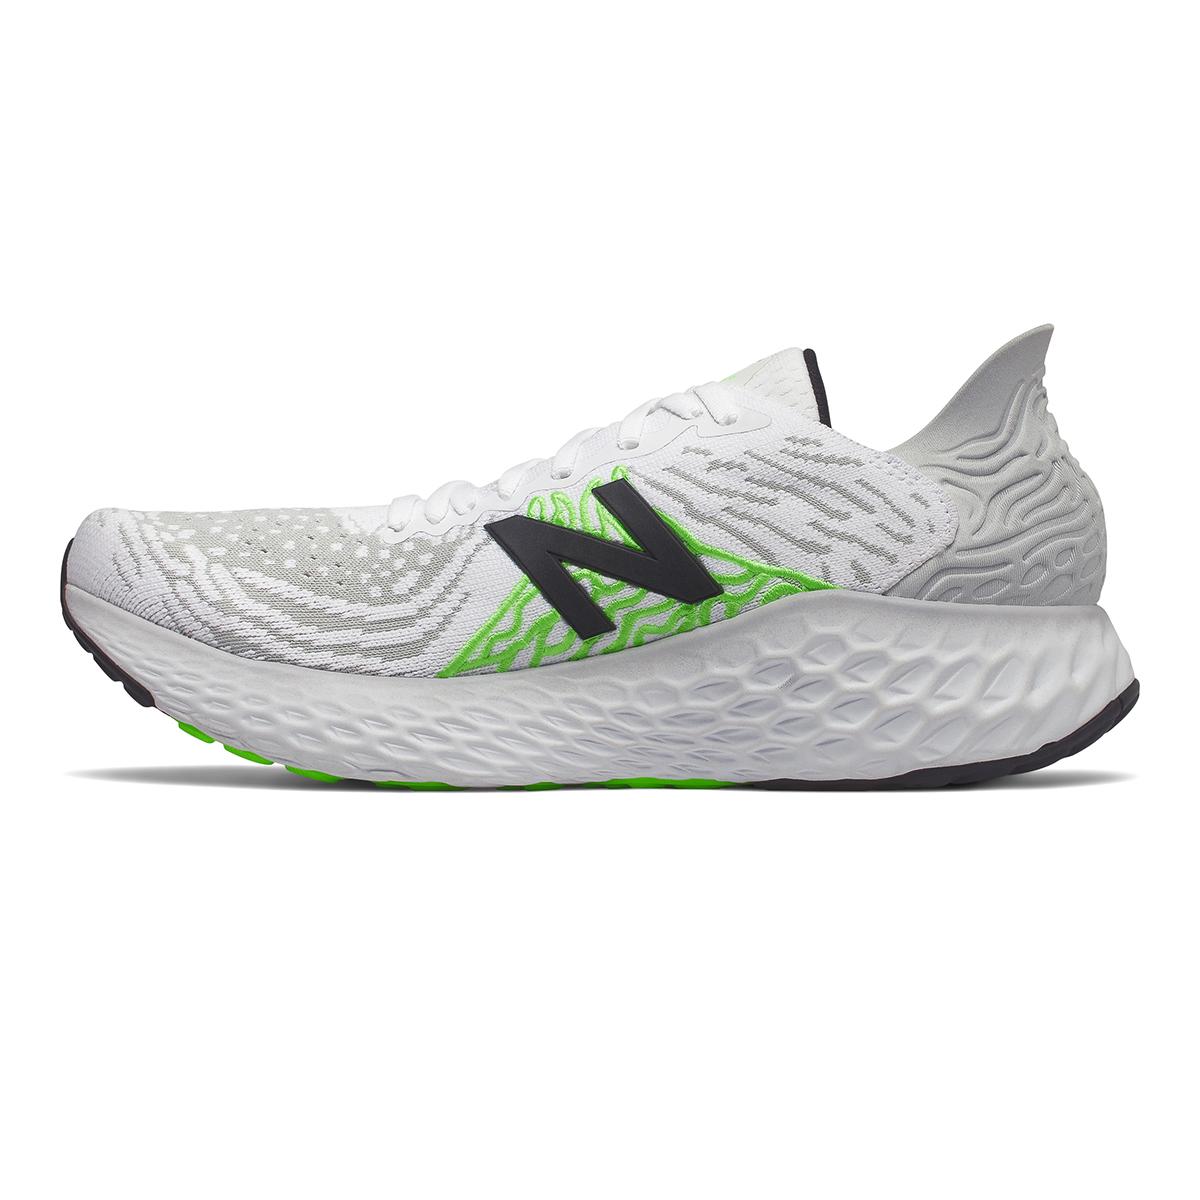 Men's New Balance Fresh Foam 1080v10 Running Shoe, , large, image 2